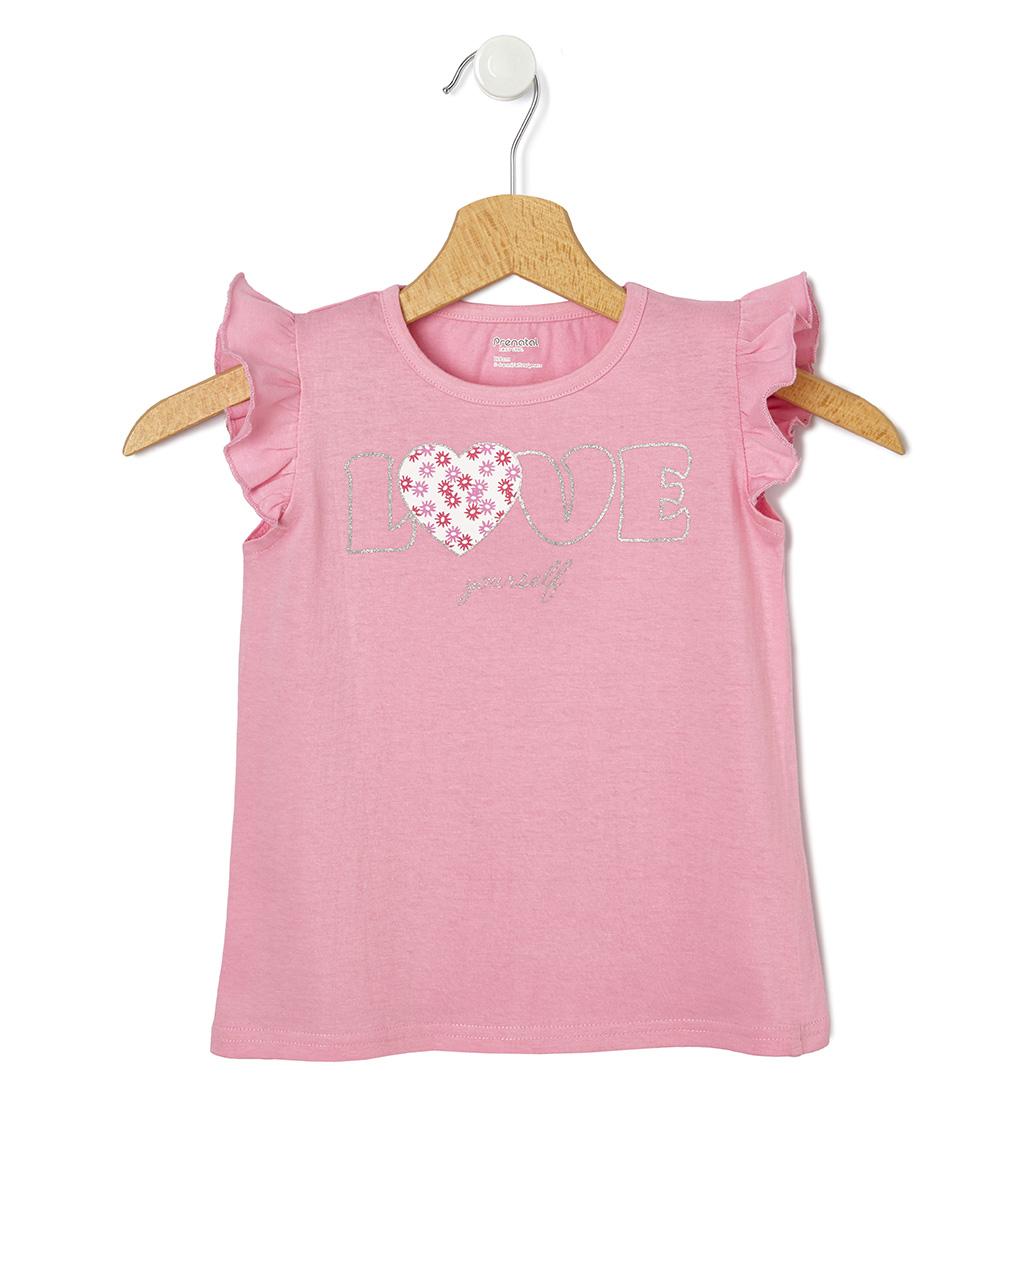 T-Shirt Jersey Ροζ με Στάμπα Love για Κορίτσι